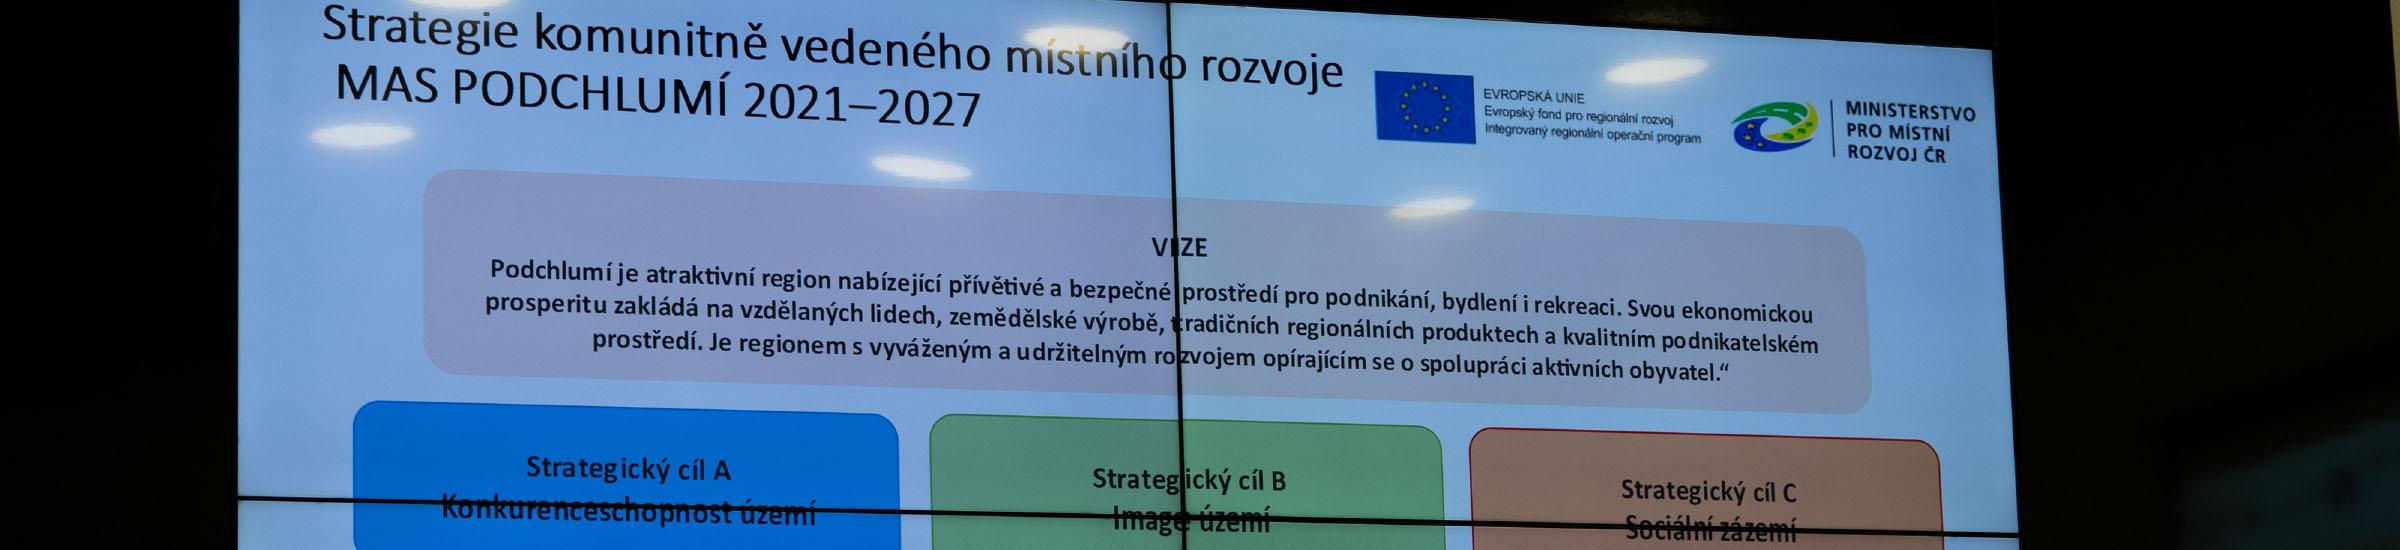 Strategie 2021-2027